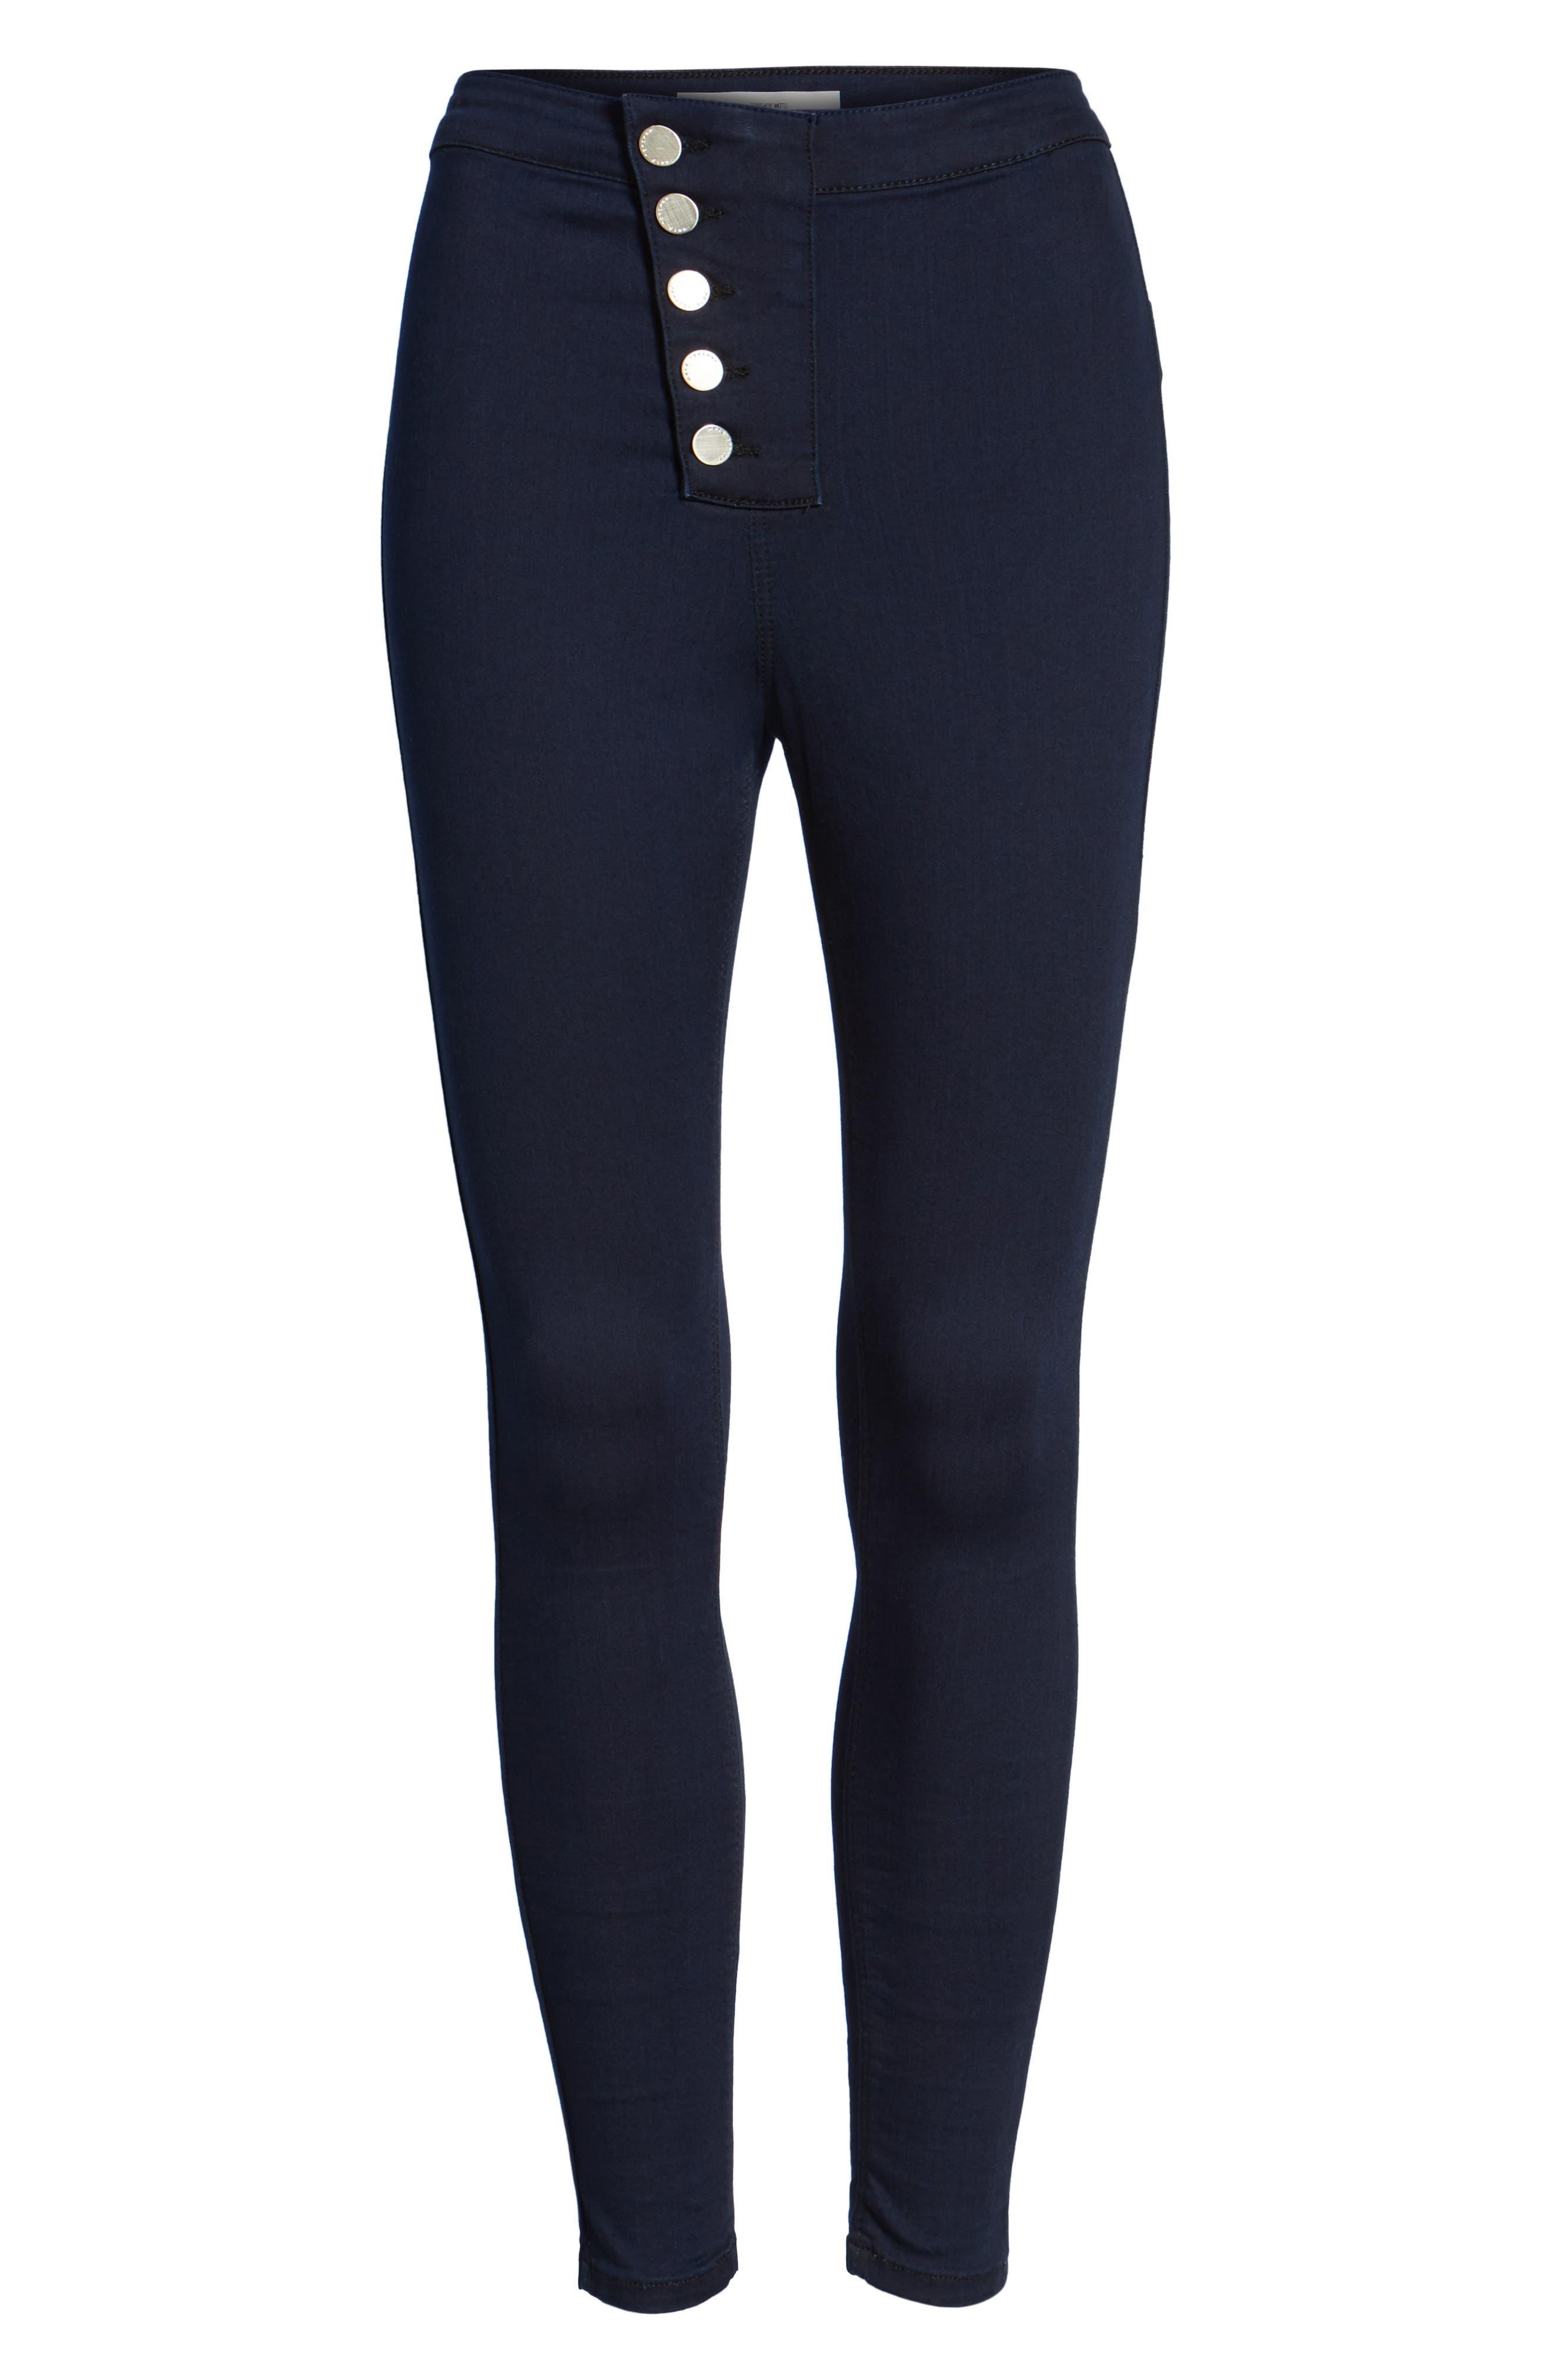 Joni Button Front Skinny Jeans,                             Alternate thumbnail 6, color,                             401